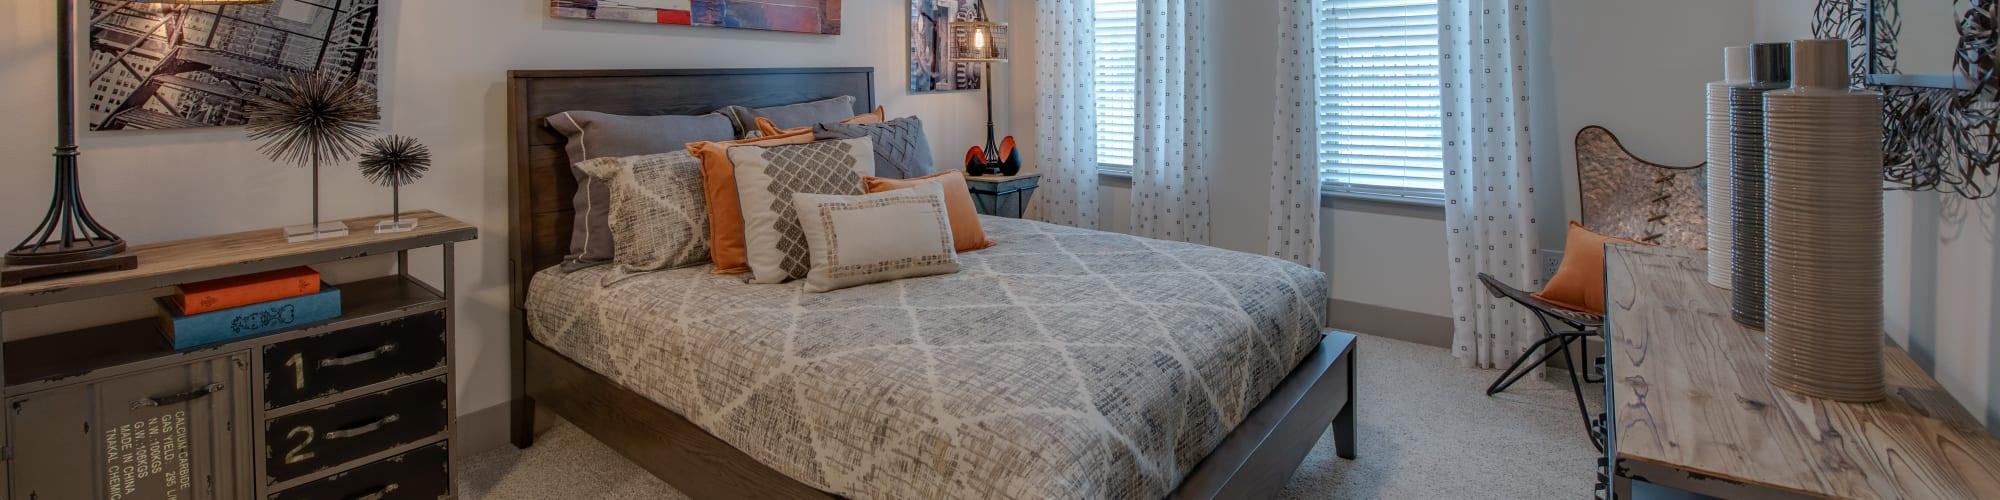 Apartments at Bellrock Upper North in Haltom City, Texas